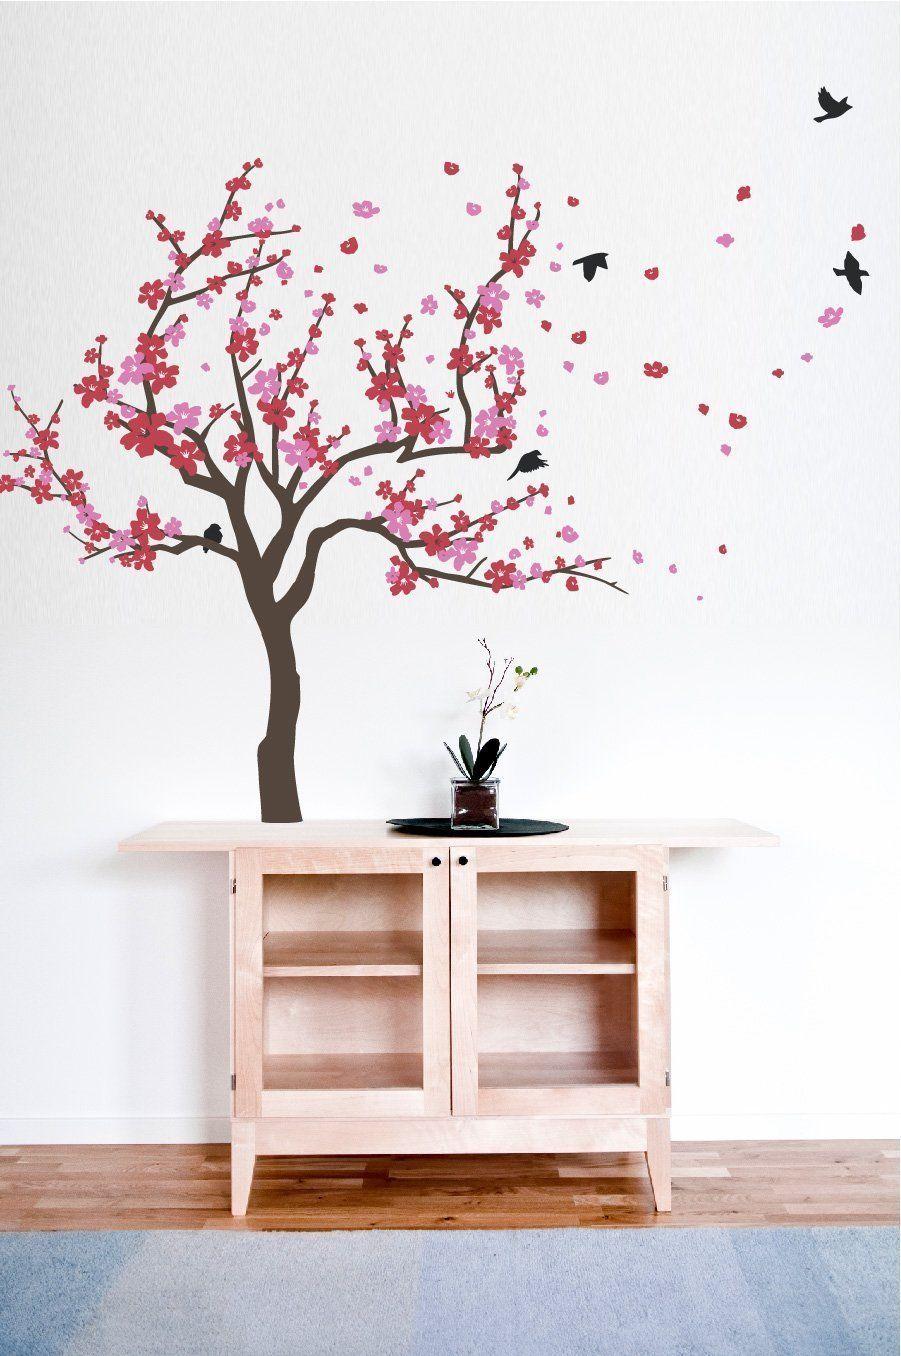 New Japanese Cherry Blossom Tree And Birds Wall Decal Sticker For Baby Nursery Stena Trafarety